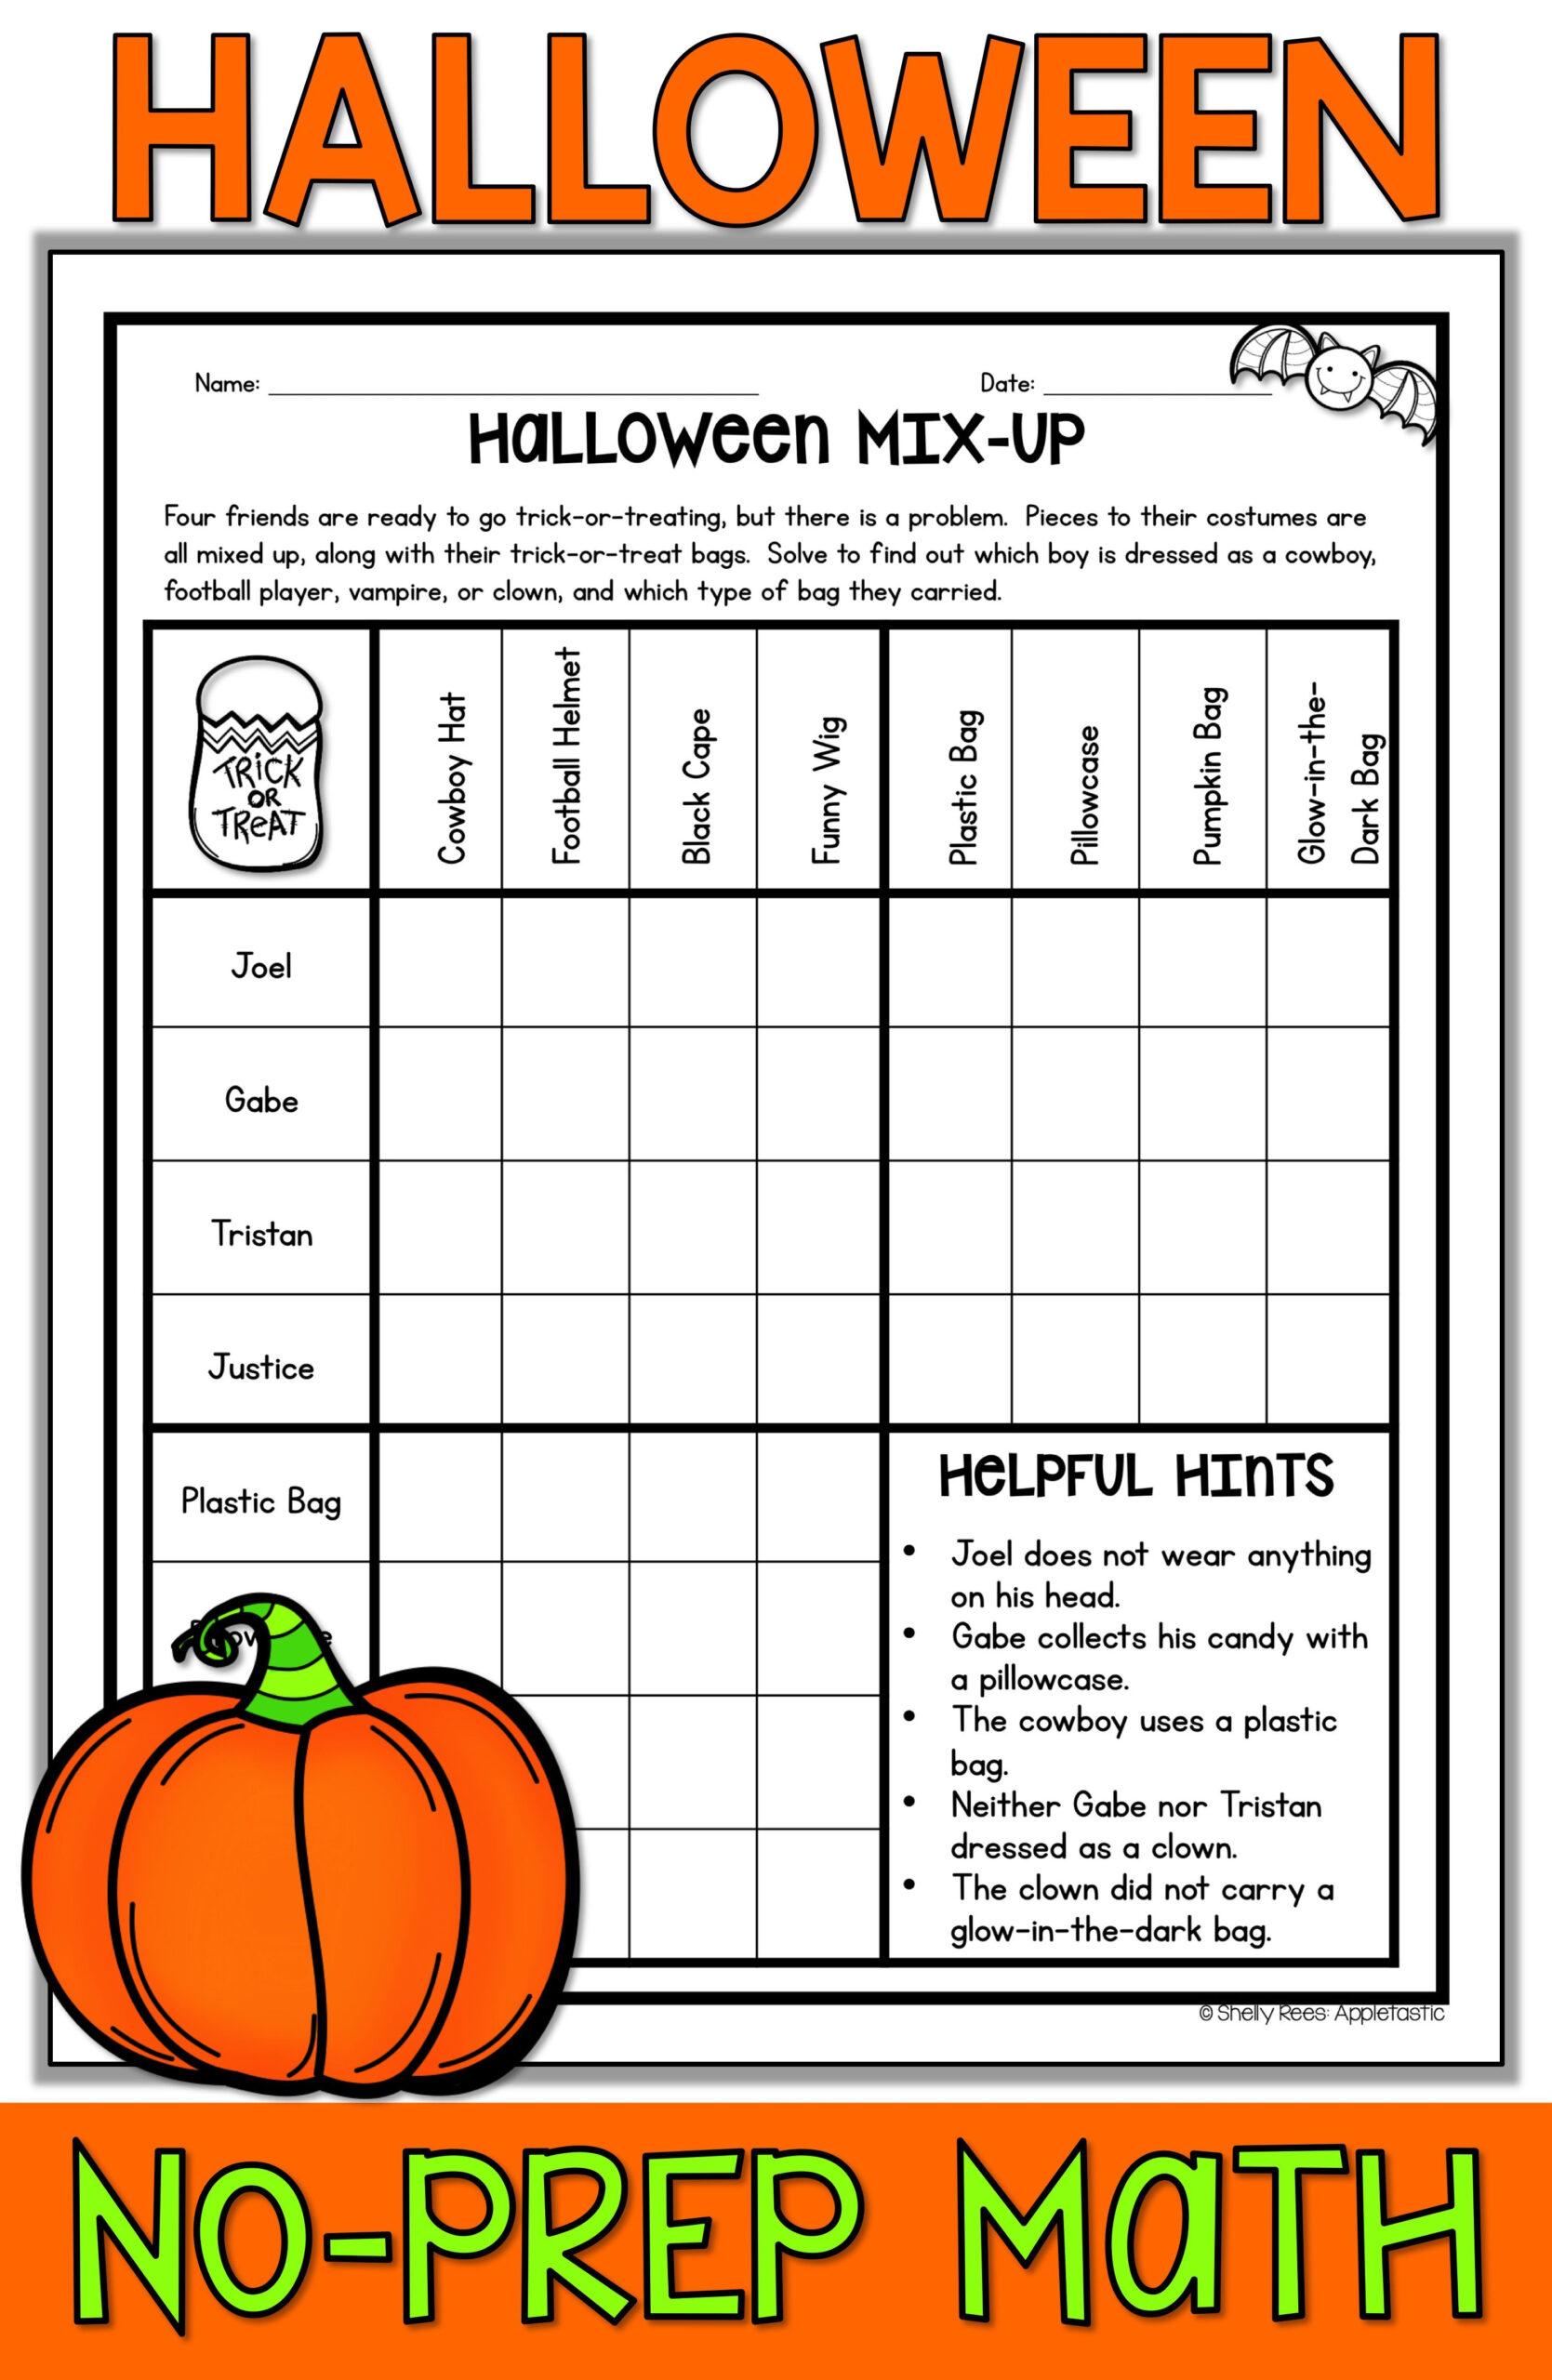 Halloween Mix Up Worksheet Answer Key